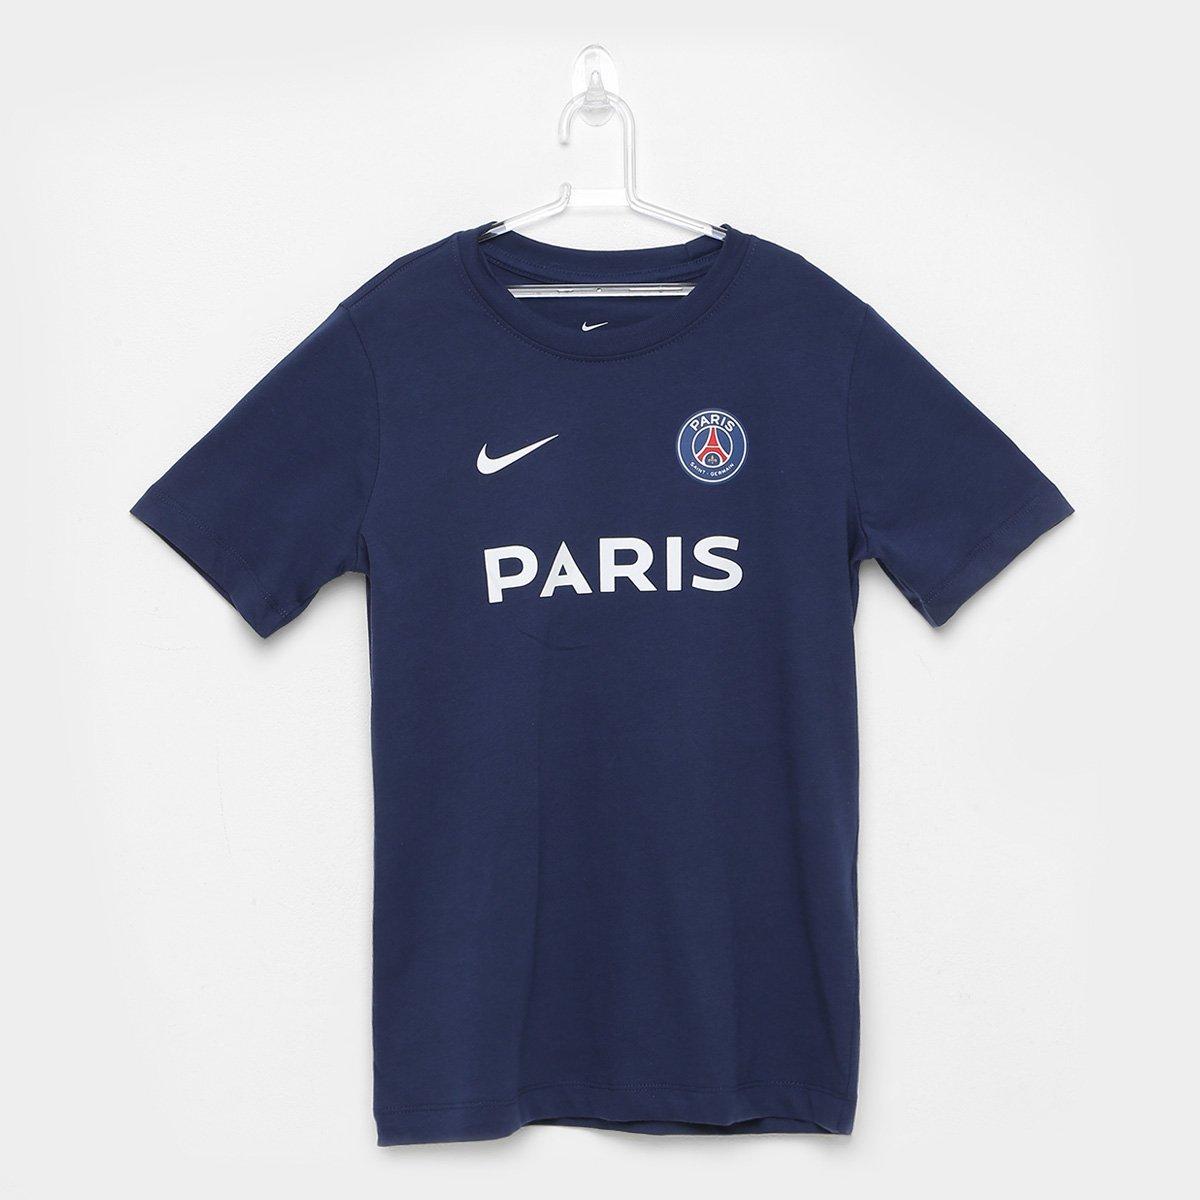 sneakers for cheap 75483 cf70a Camiseta Infantil Paris Saint-Germain Nike Core Match - Marinho